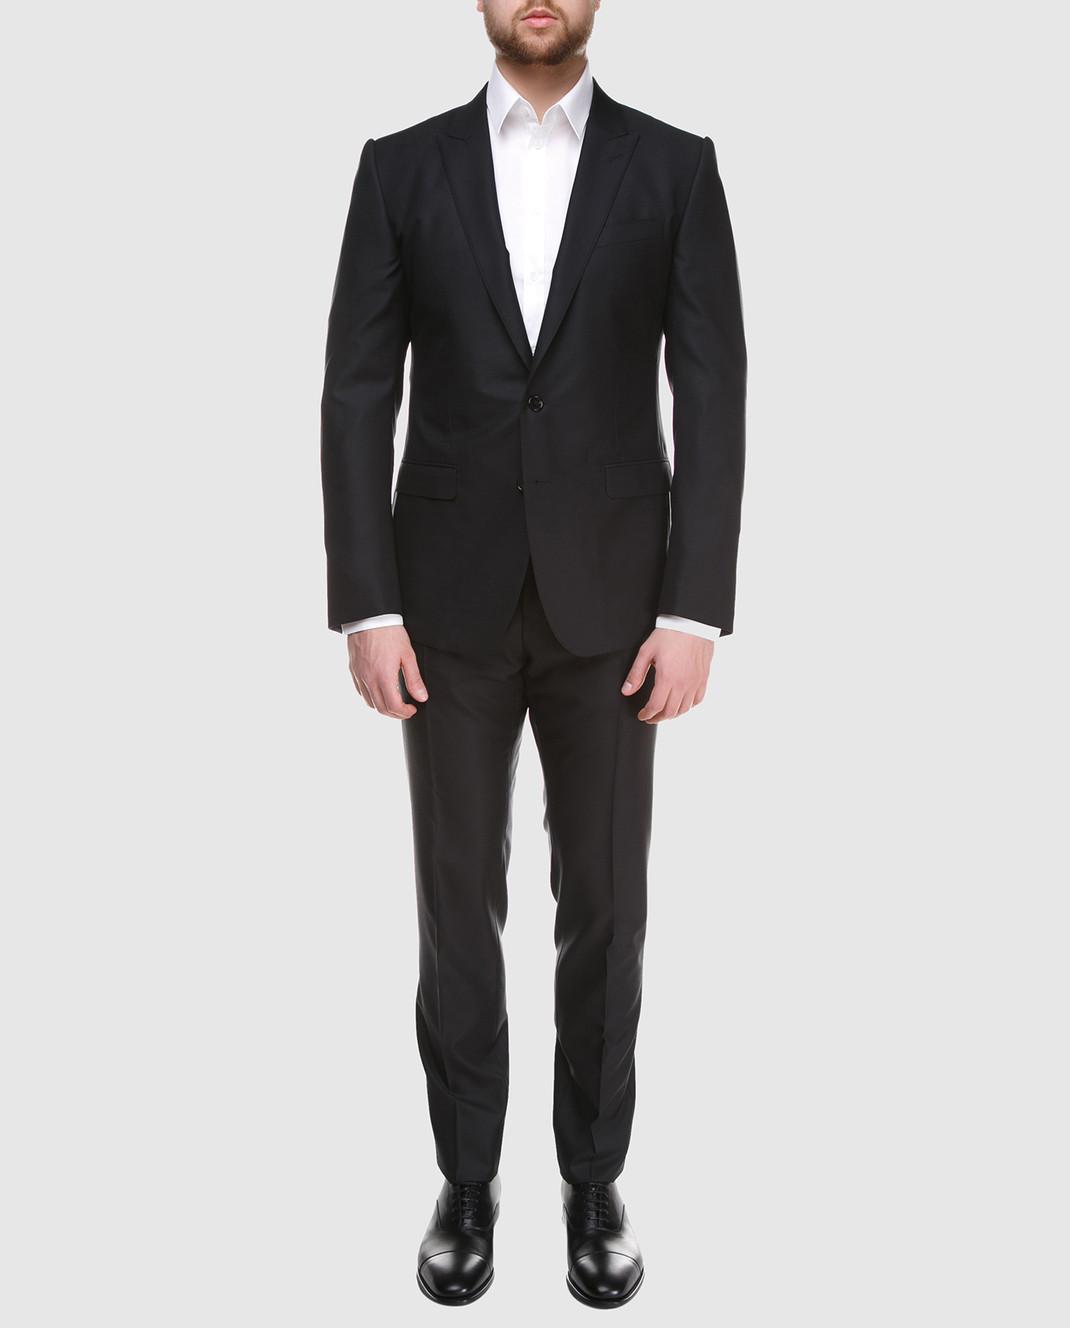 Dolce&Gabbana Черный костюм GK0RMTFU3N0 изображение 3